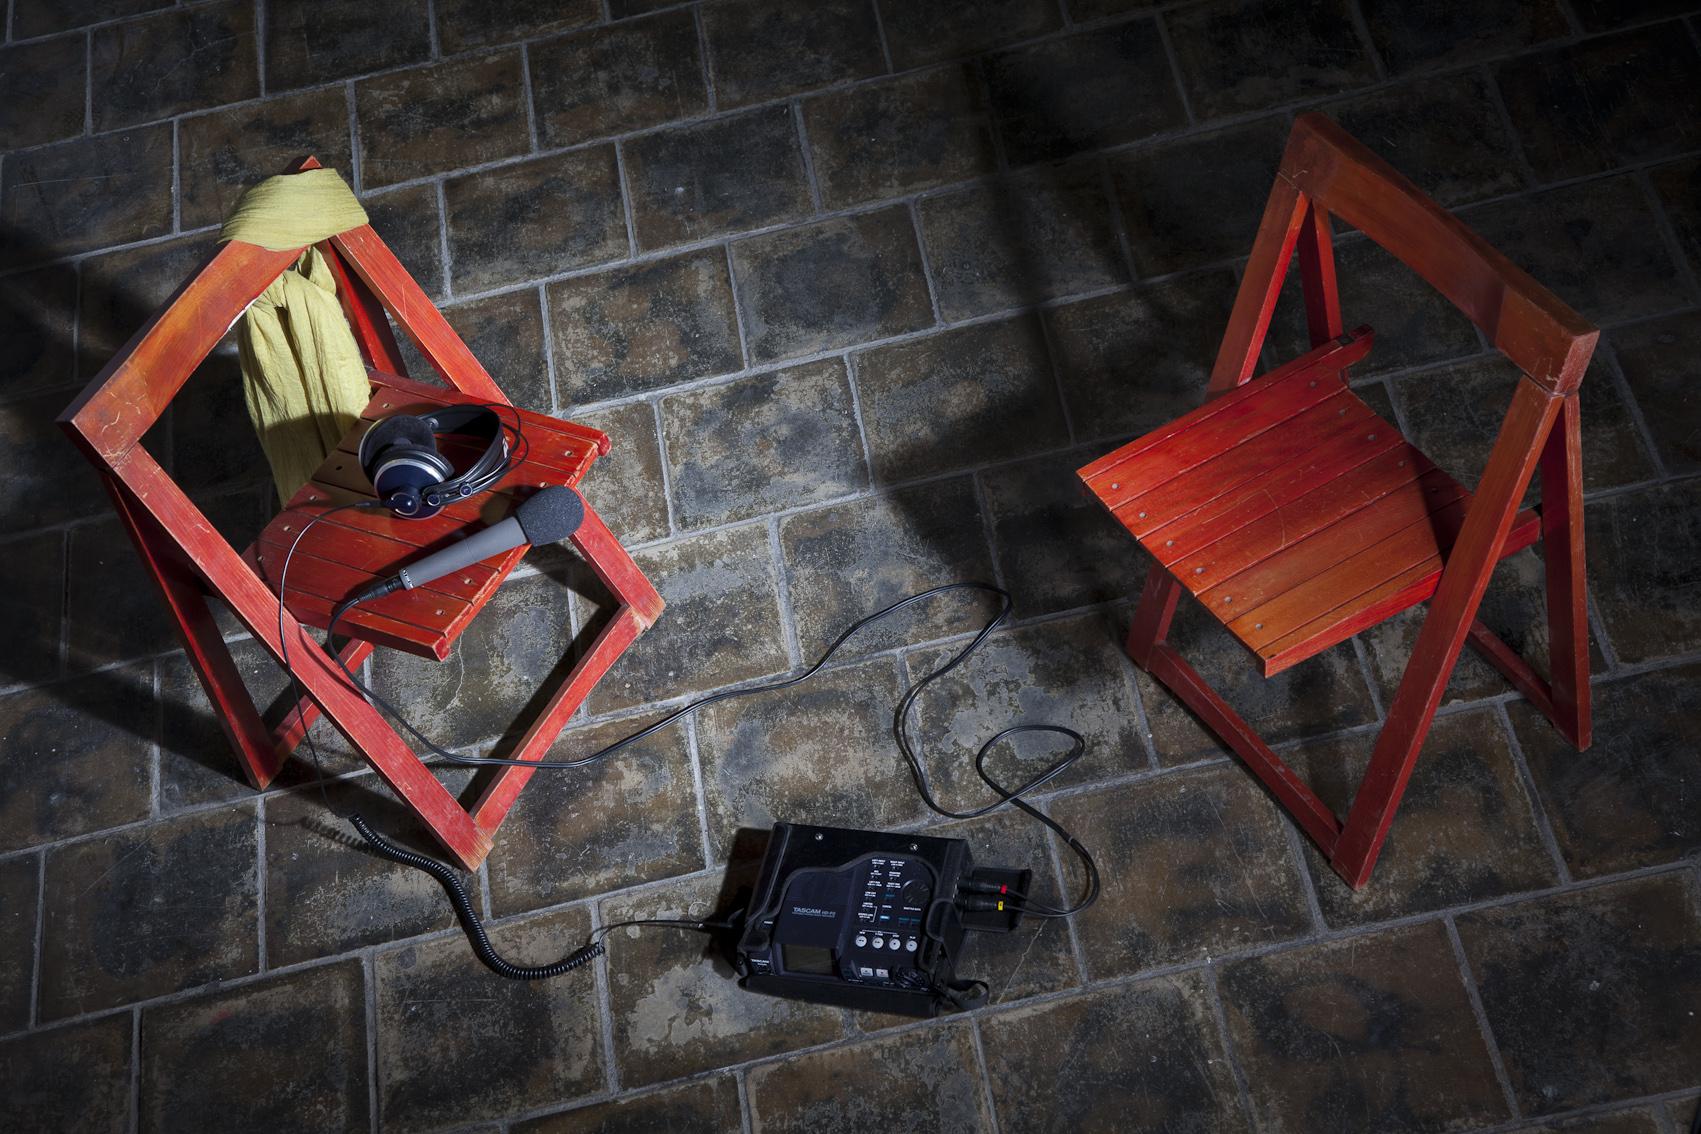 Zwei Stühle mit Mikrofon, Kopfhörern, Aufnahmegerät, Augenbinde